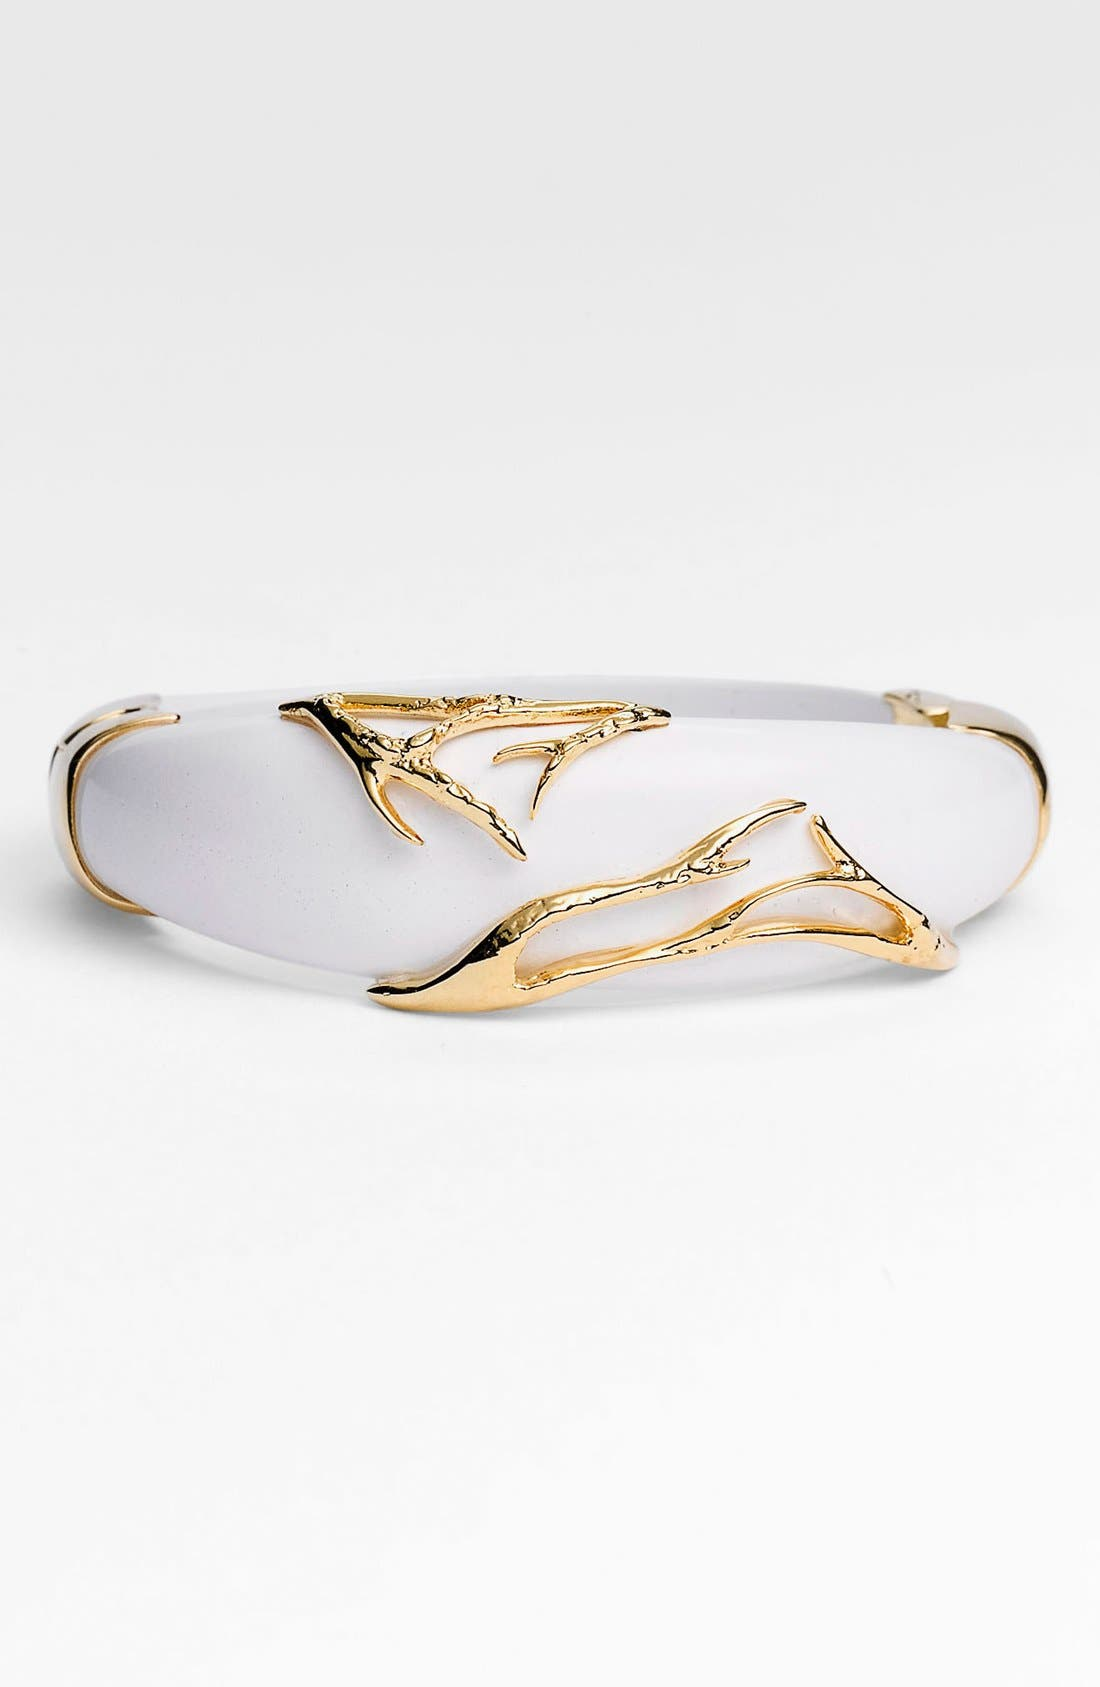 Alternate Image 1 Selected - Alexis Bittar 'Miss Havisham - Liquid Gold' Tapered Bracelet